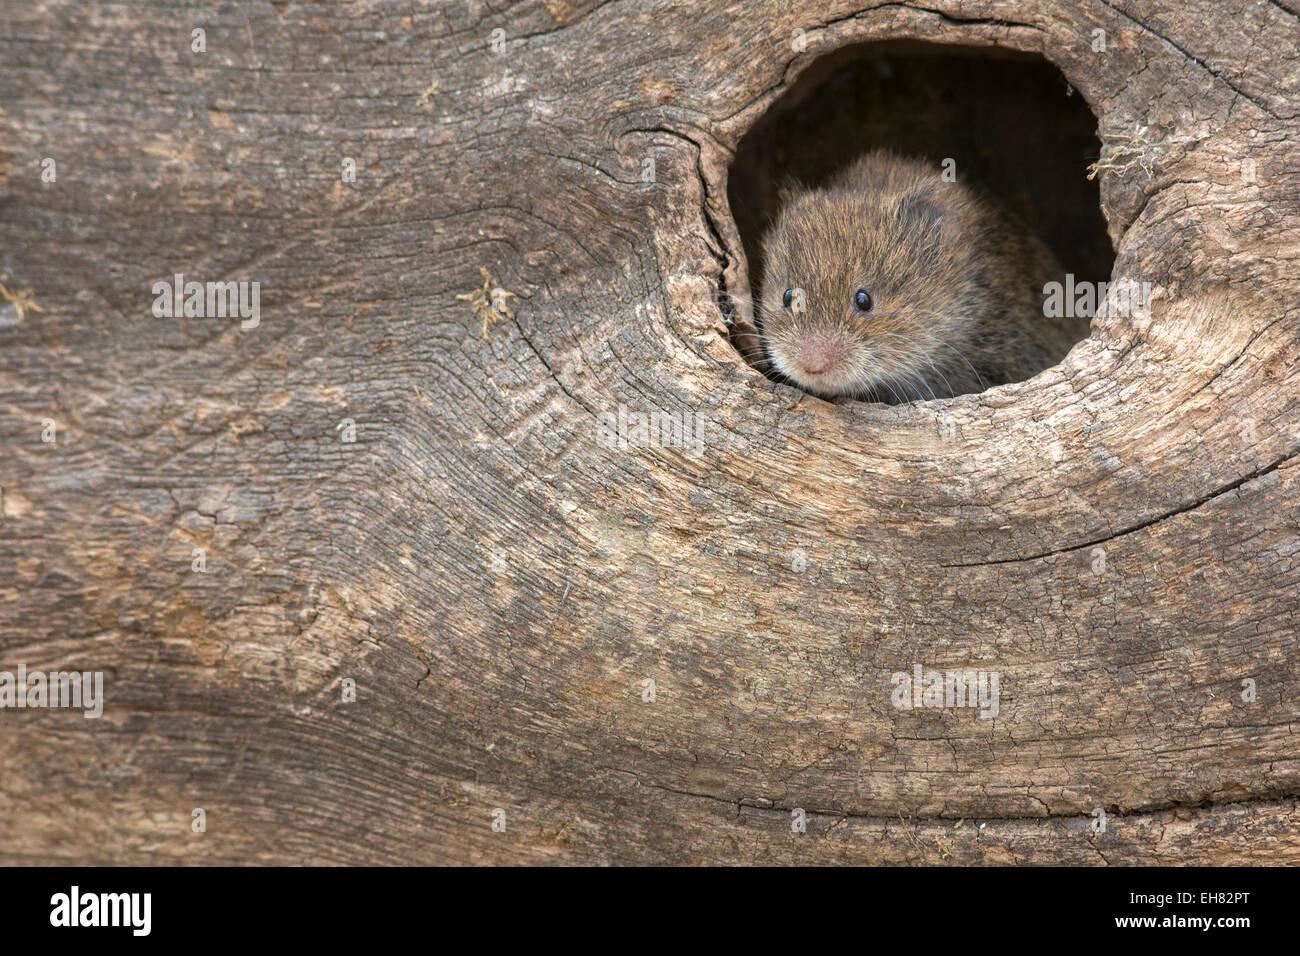 Field vole (Short-tailed vole) (Microtus agrestis), captive, United Kingdom, Europe - Stock Image